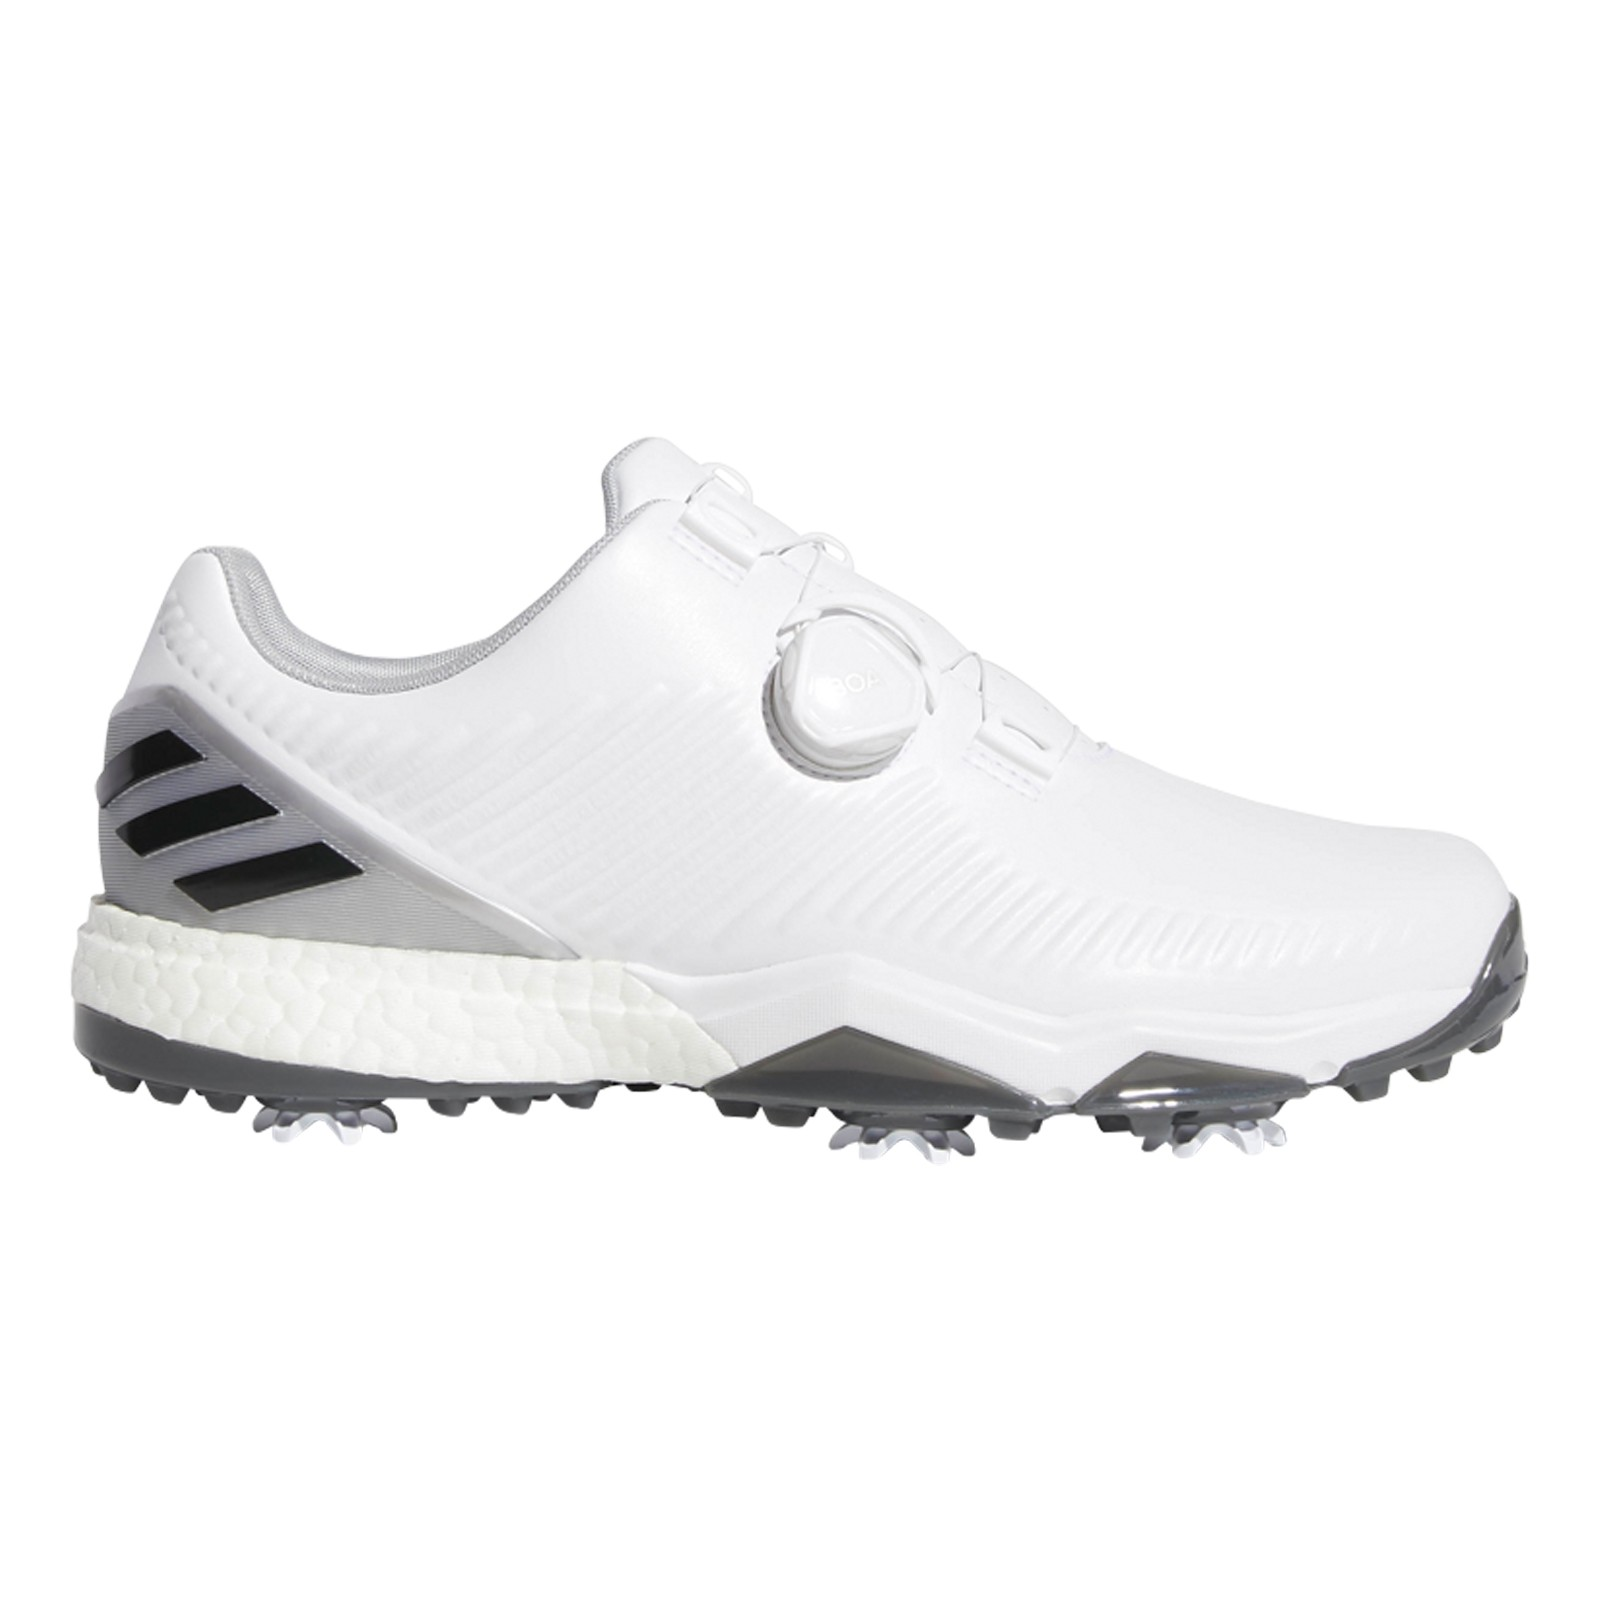 adidas Adipower 4Orged Boa Golf Shoes